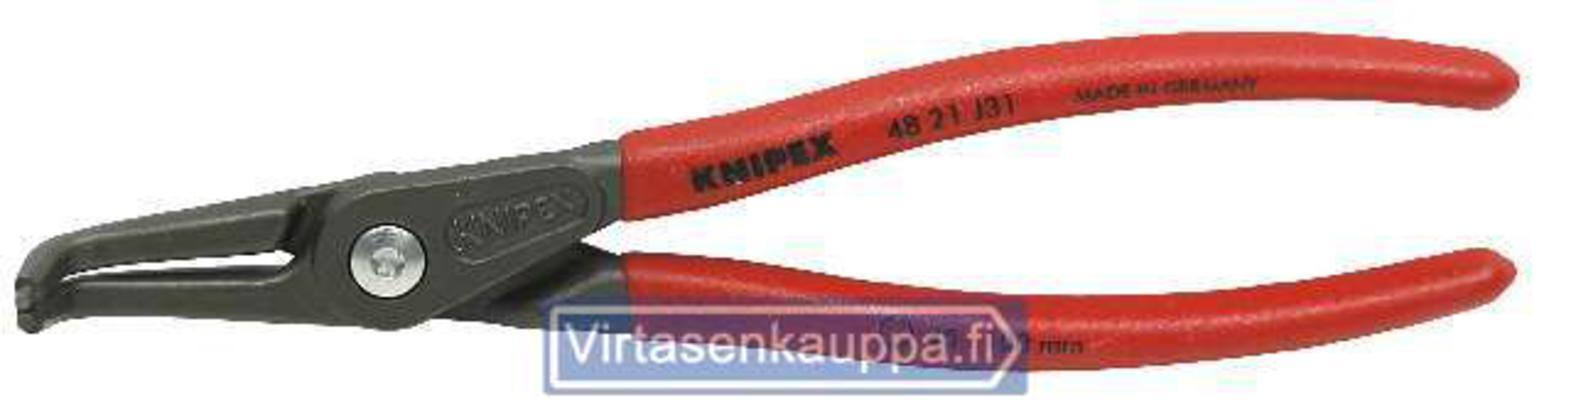 LUKKORENGASPIHTI 48 21 J31 KNIPEX